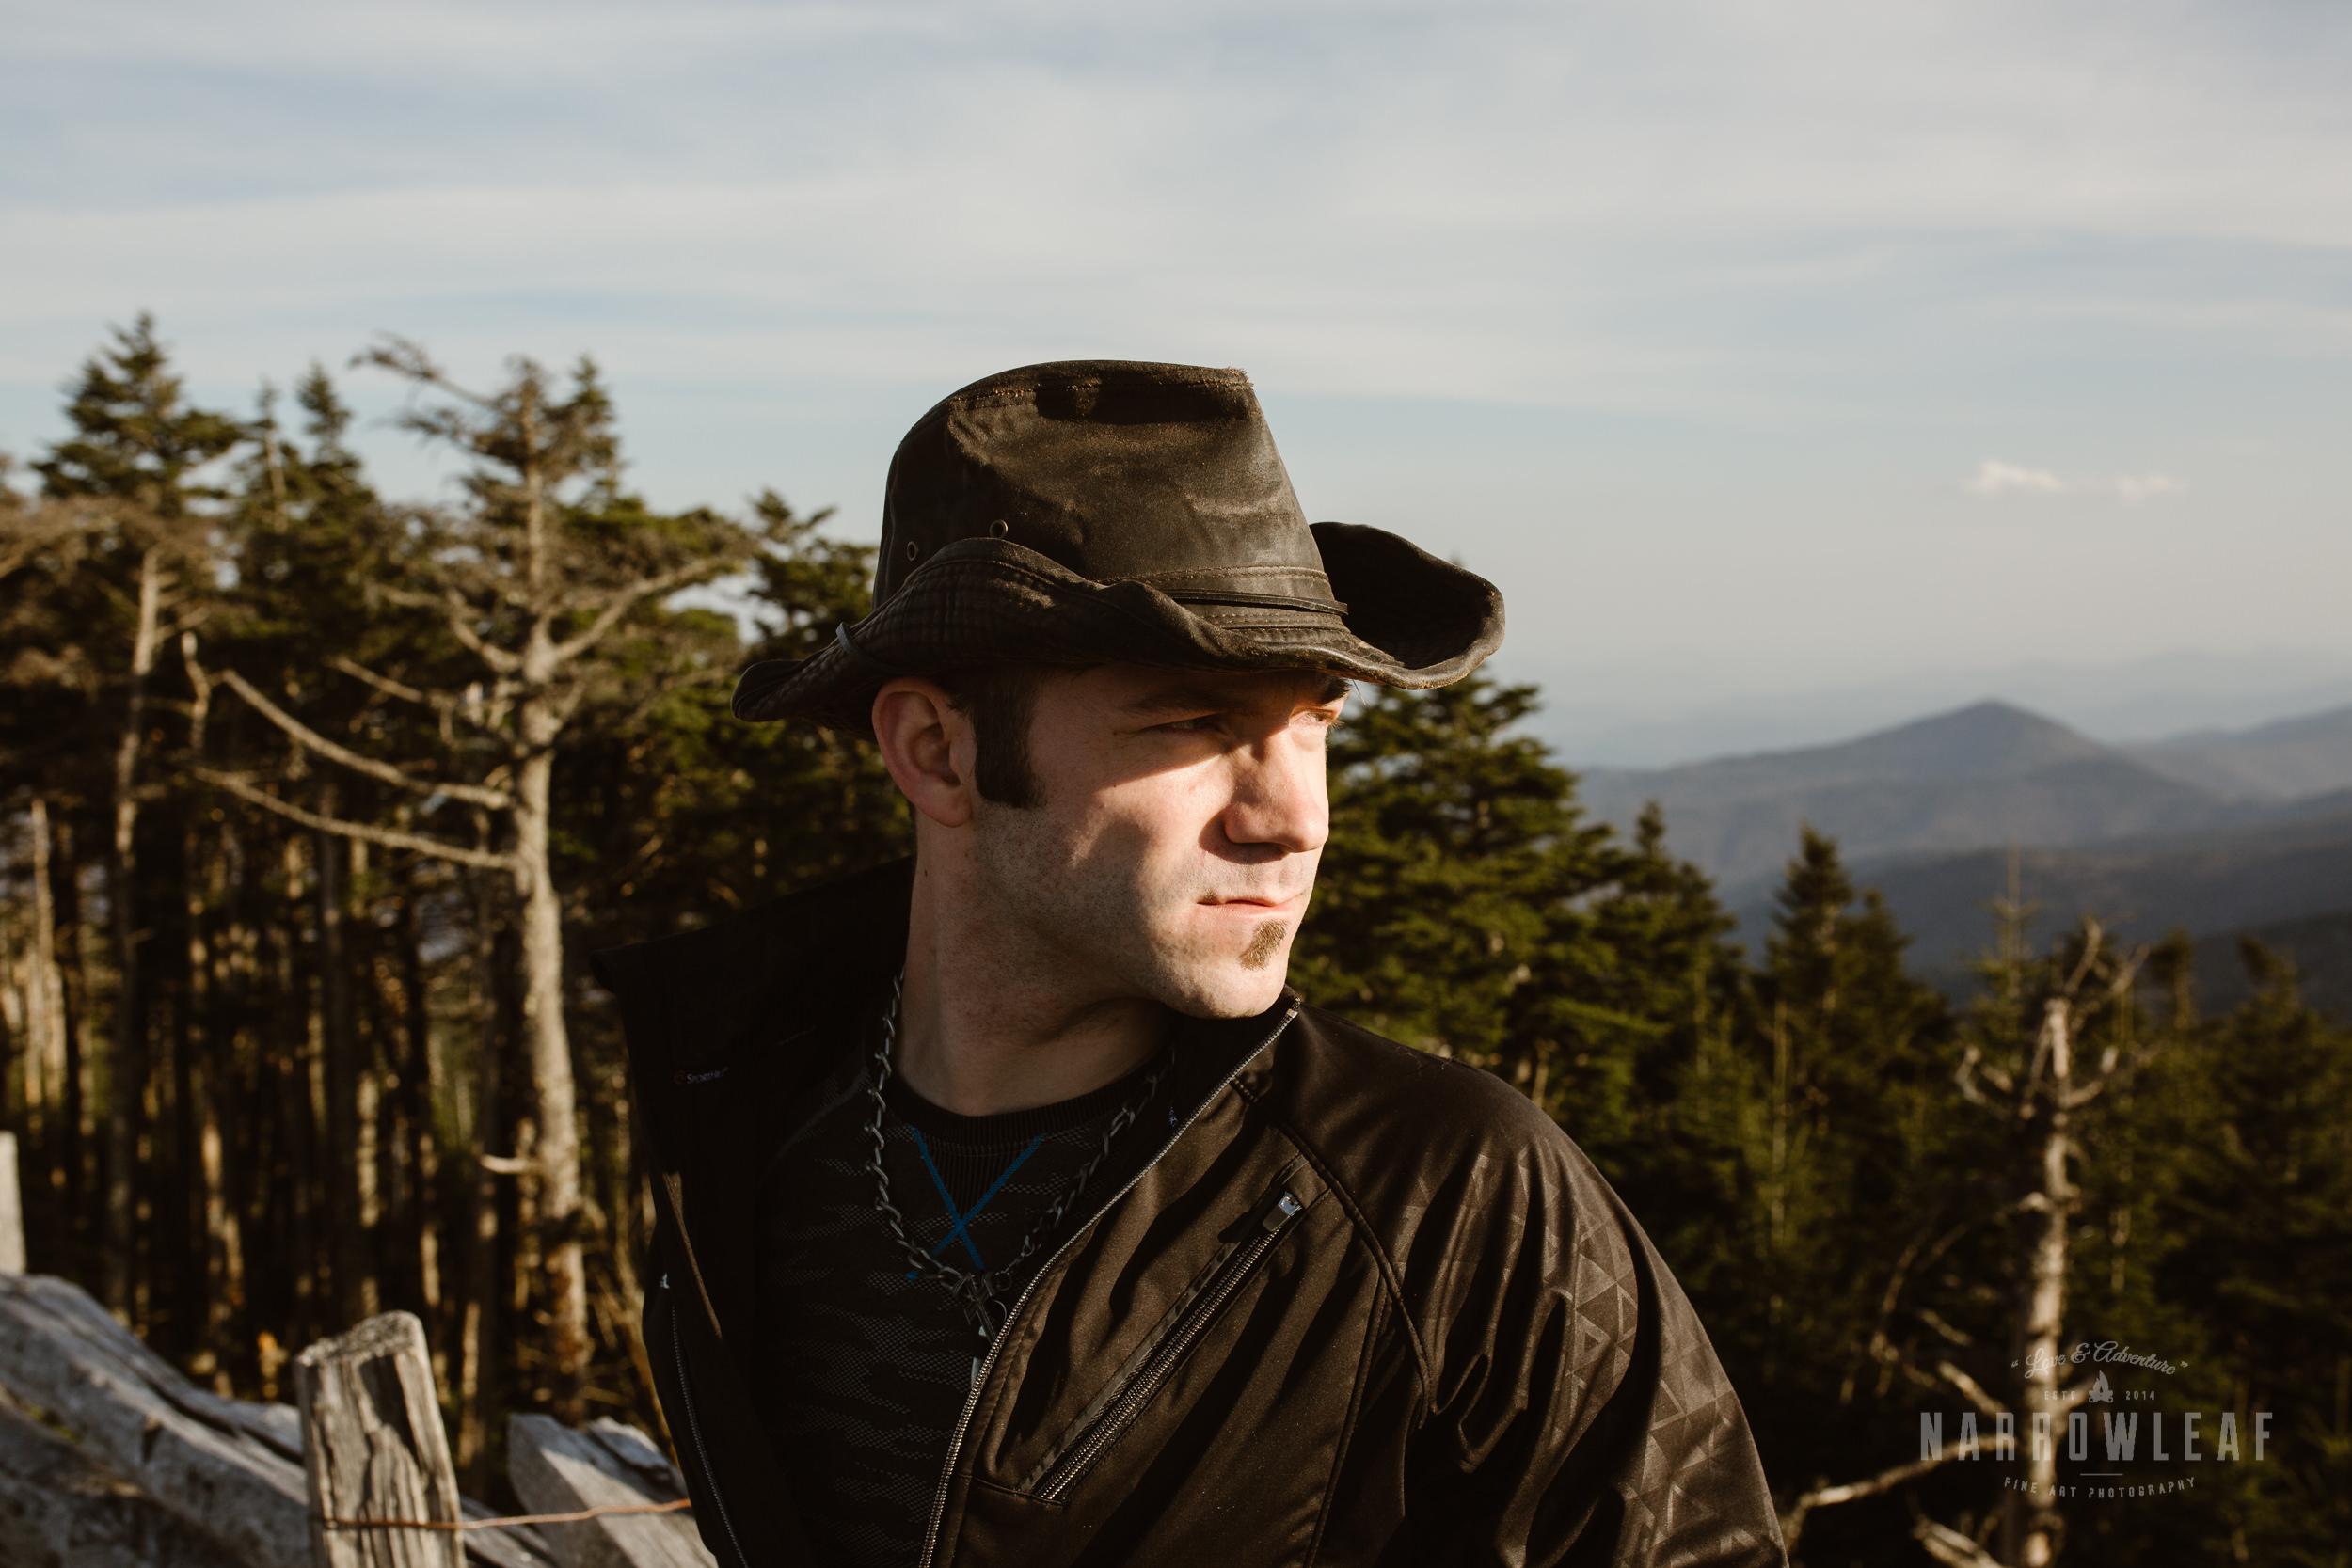 Blue-Ridge-mountains-North-Carolina-elopement-photographer-Narrowleaf_Love_and_Adventure_Photography-0282.jpg